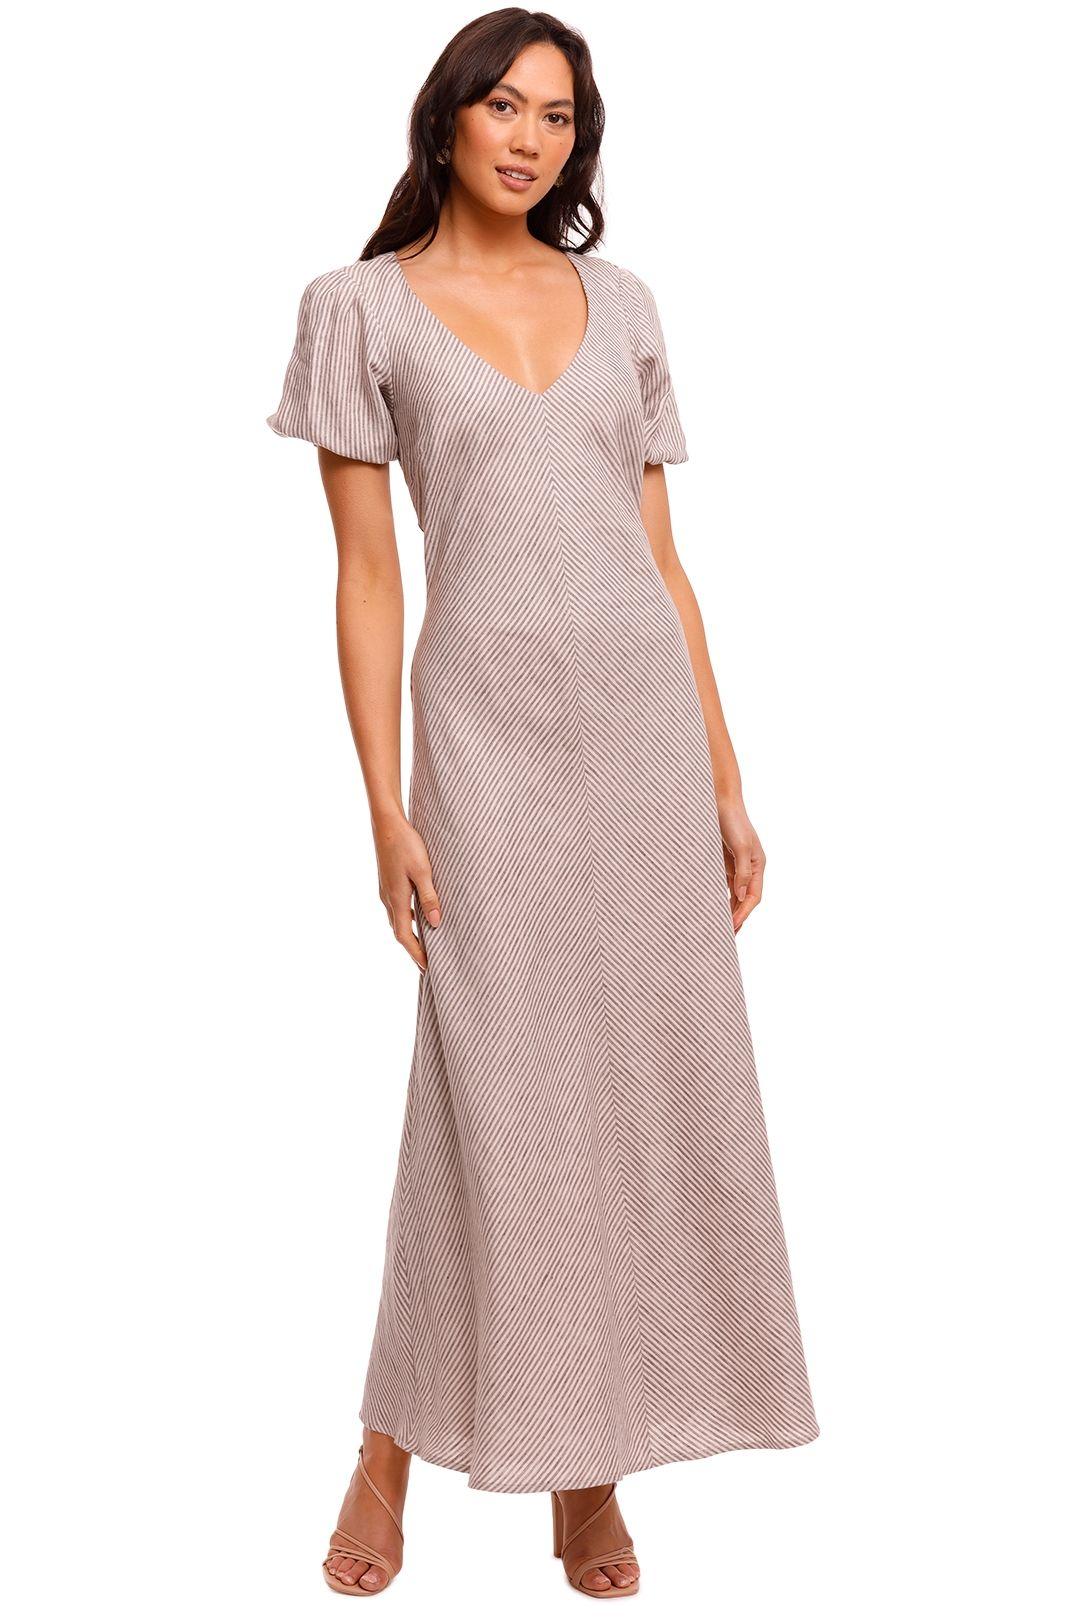 Jillian Boustred Phillipa Dress Brown Stripe maxi